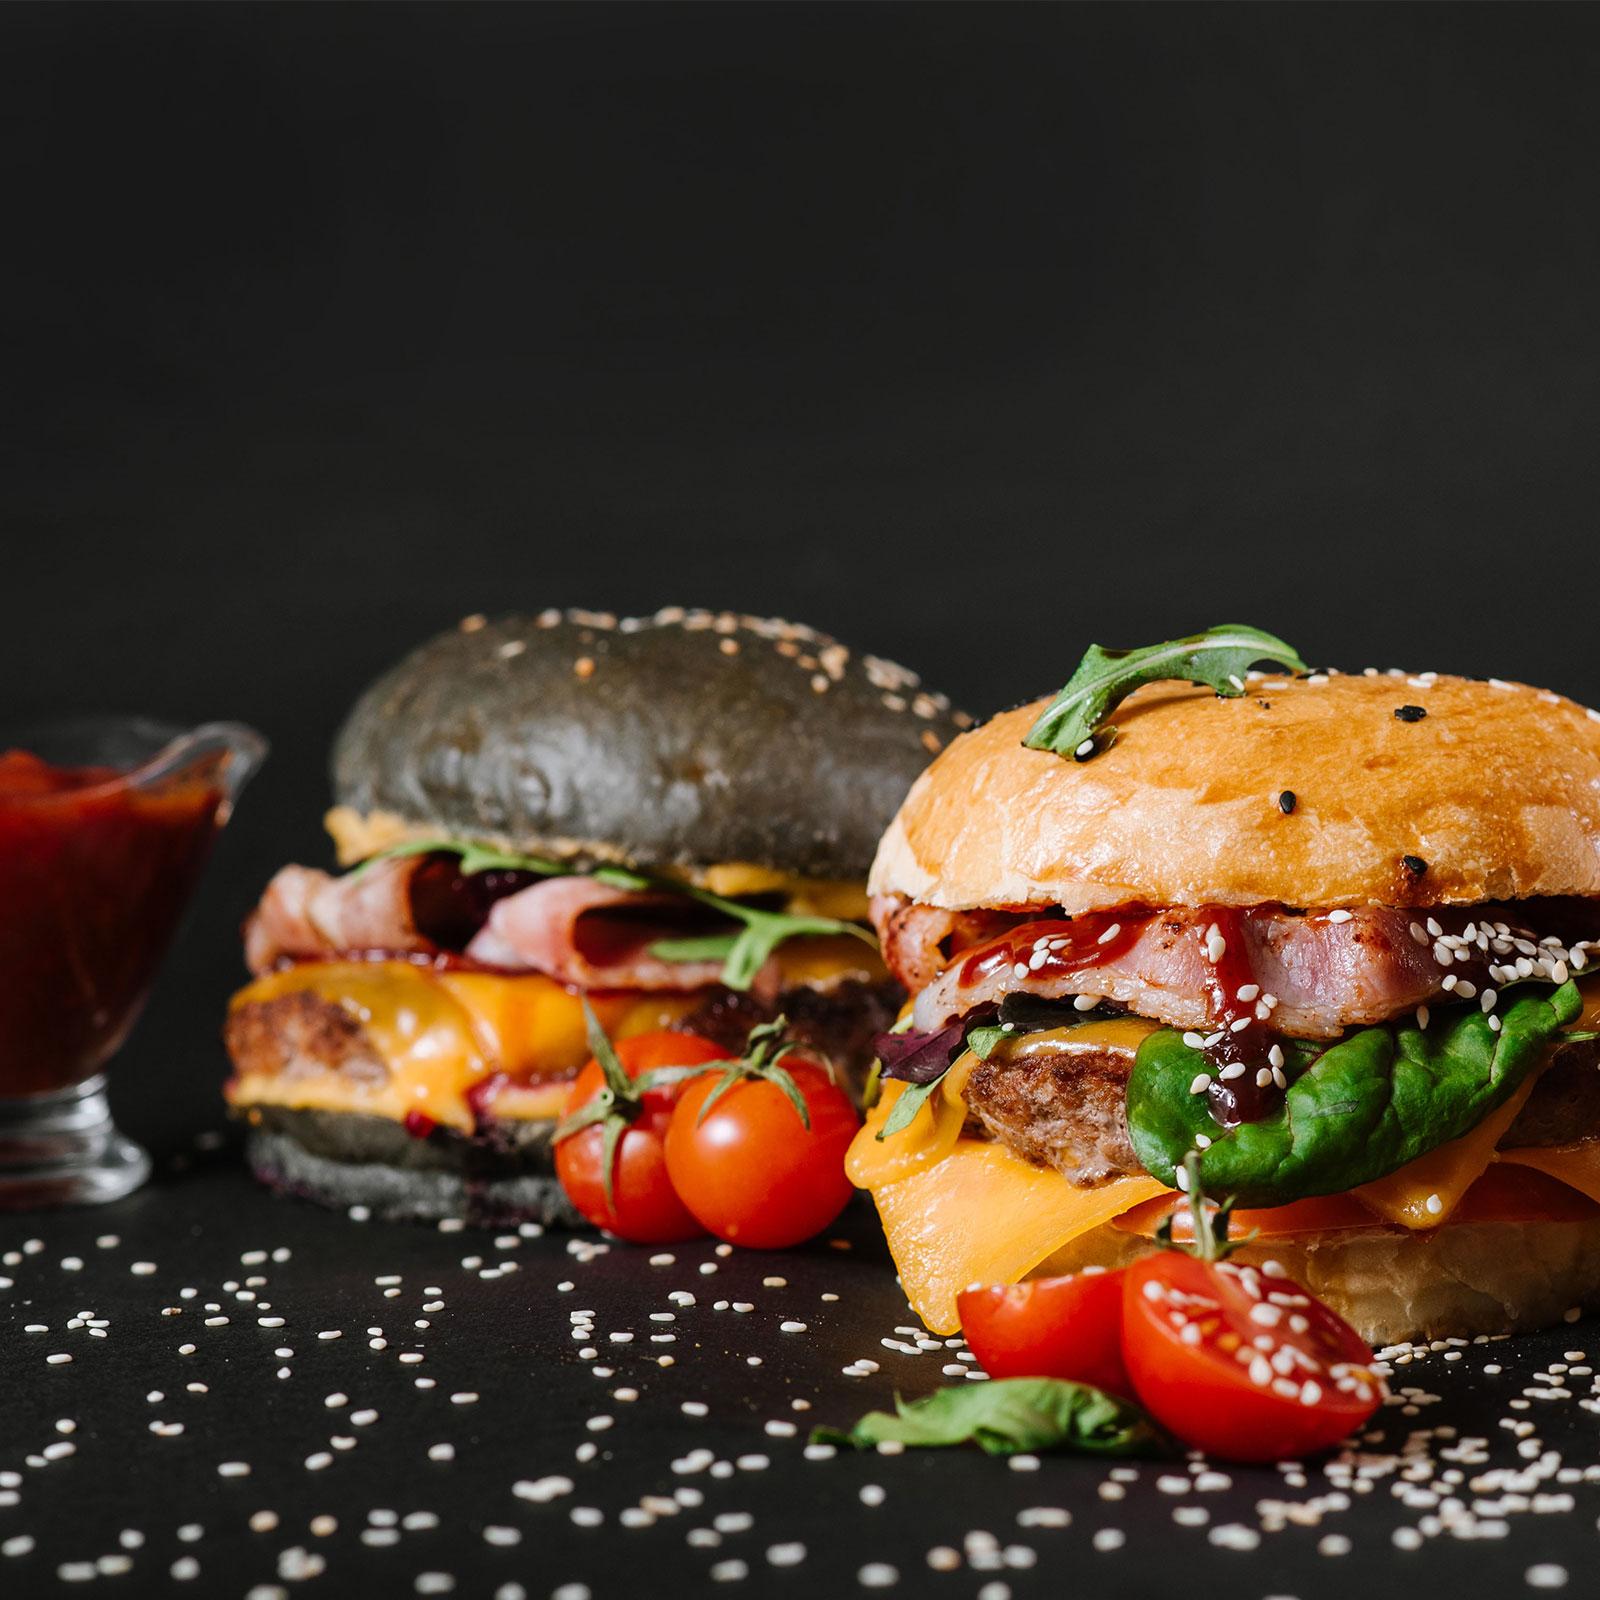 burger-grillkurs-2-0-grillakademie-saar